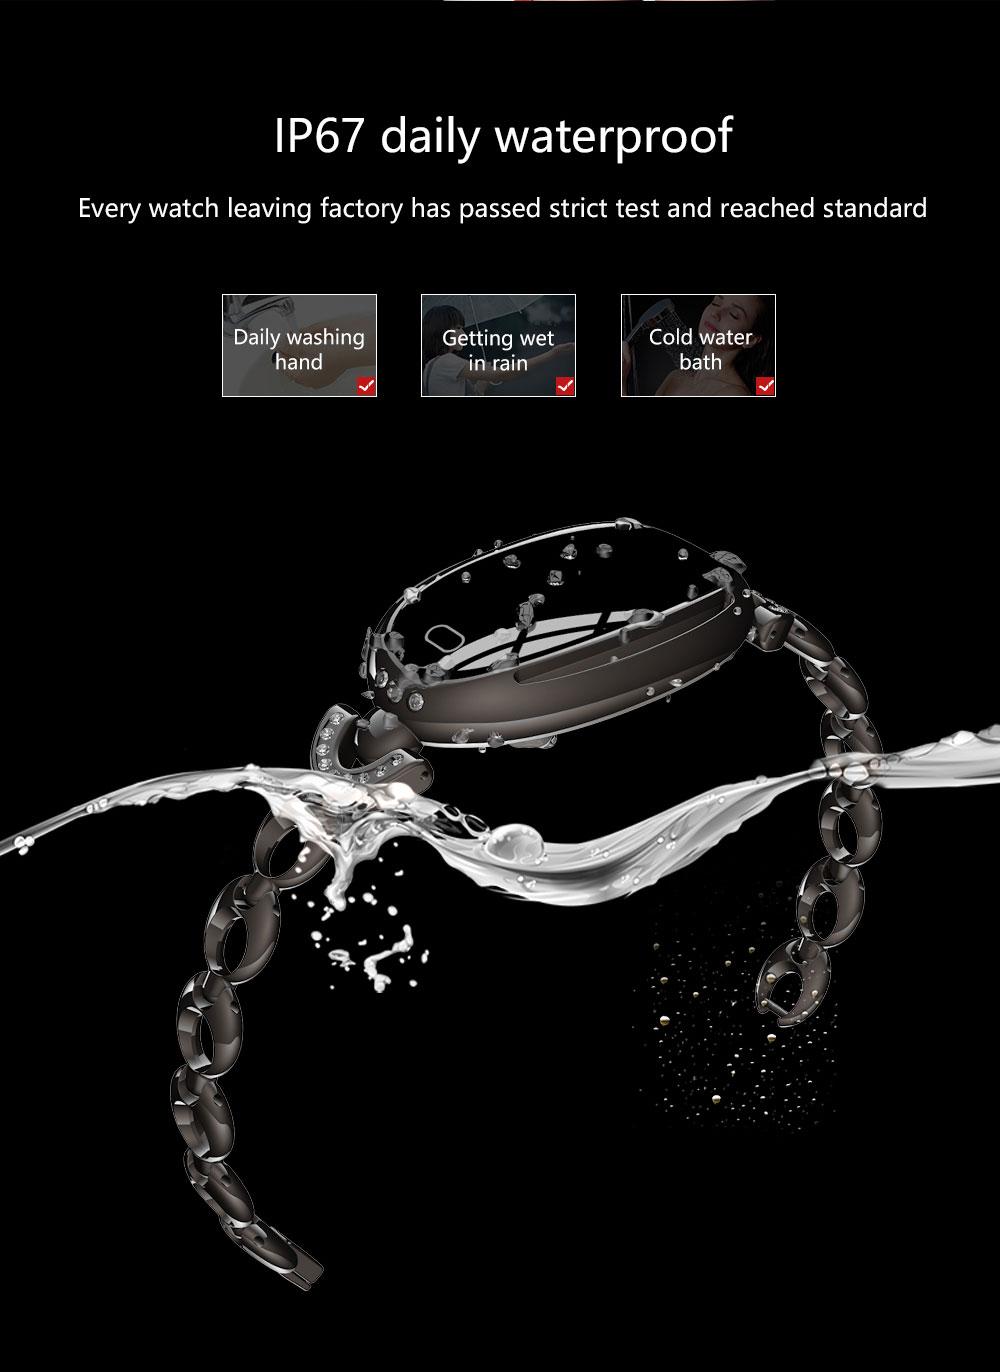 buy e68 smart bluetooth wristband